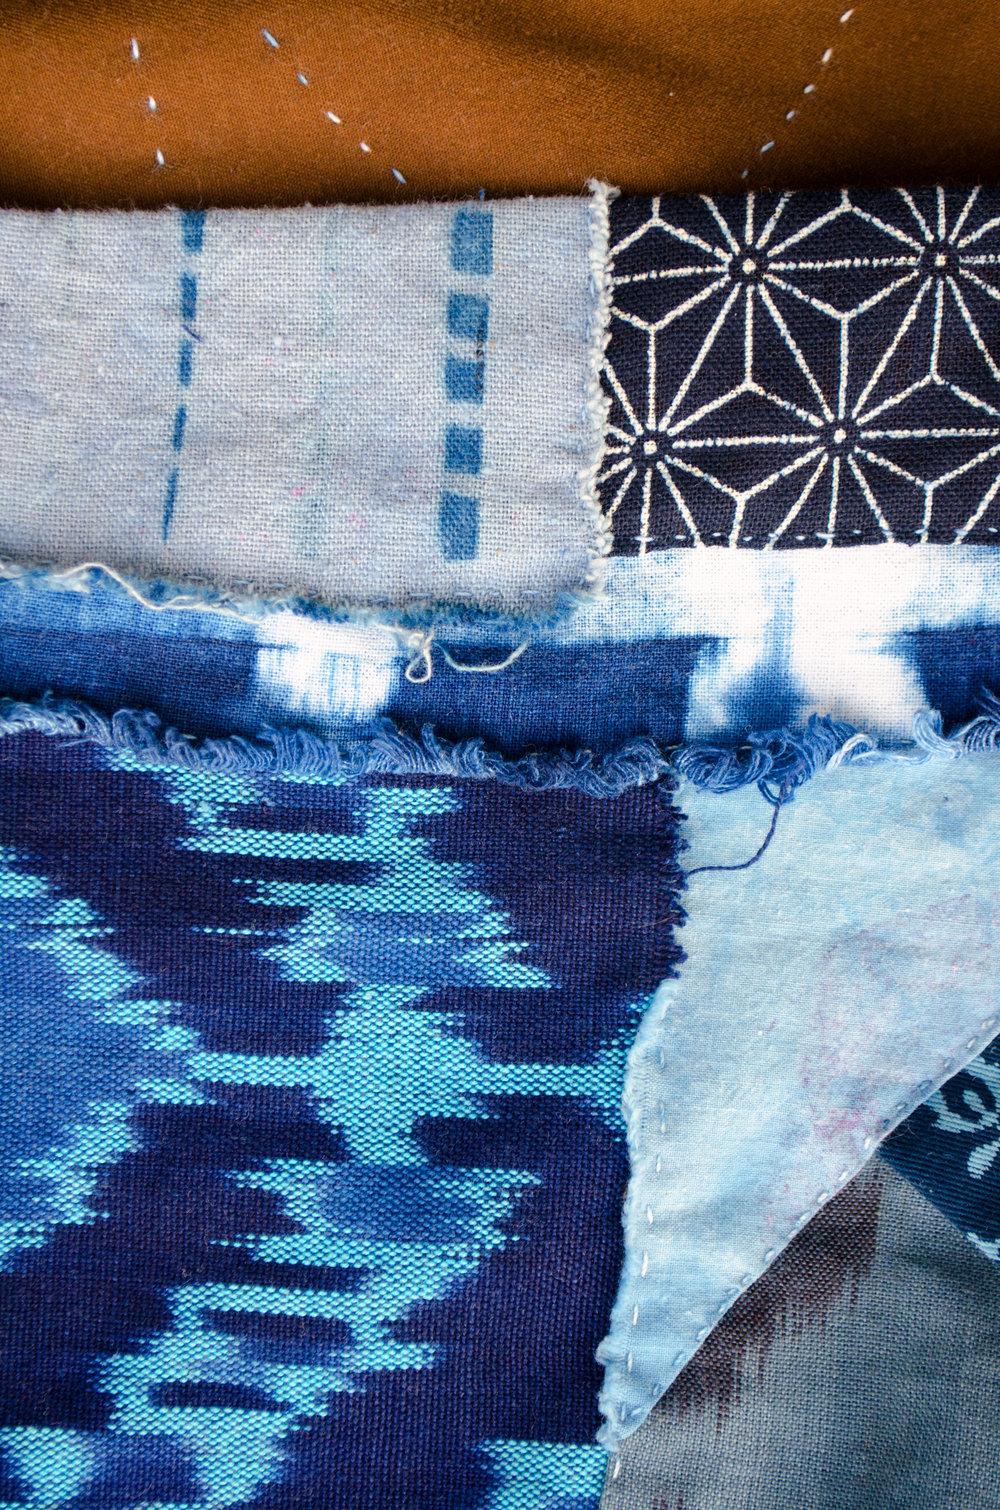 Boro stitched ikat, shibori and indigo dyed scraps by Carlyn Clark